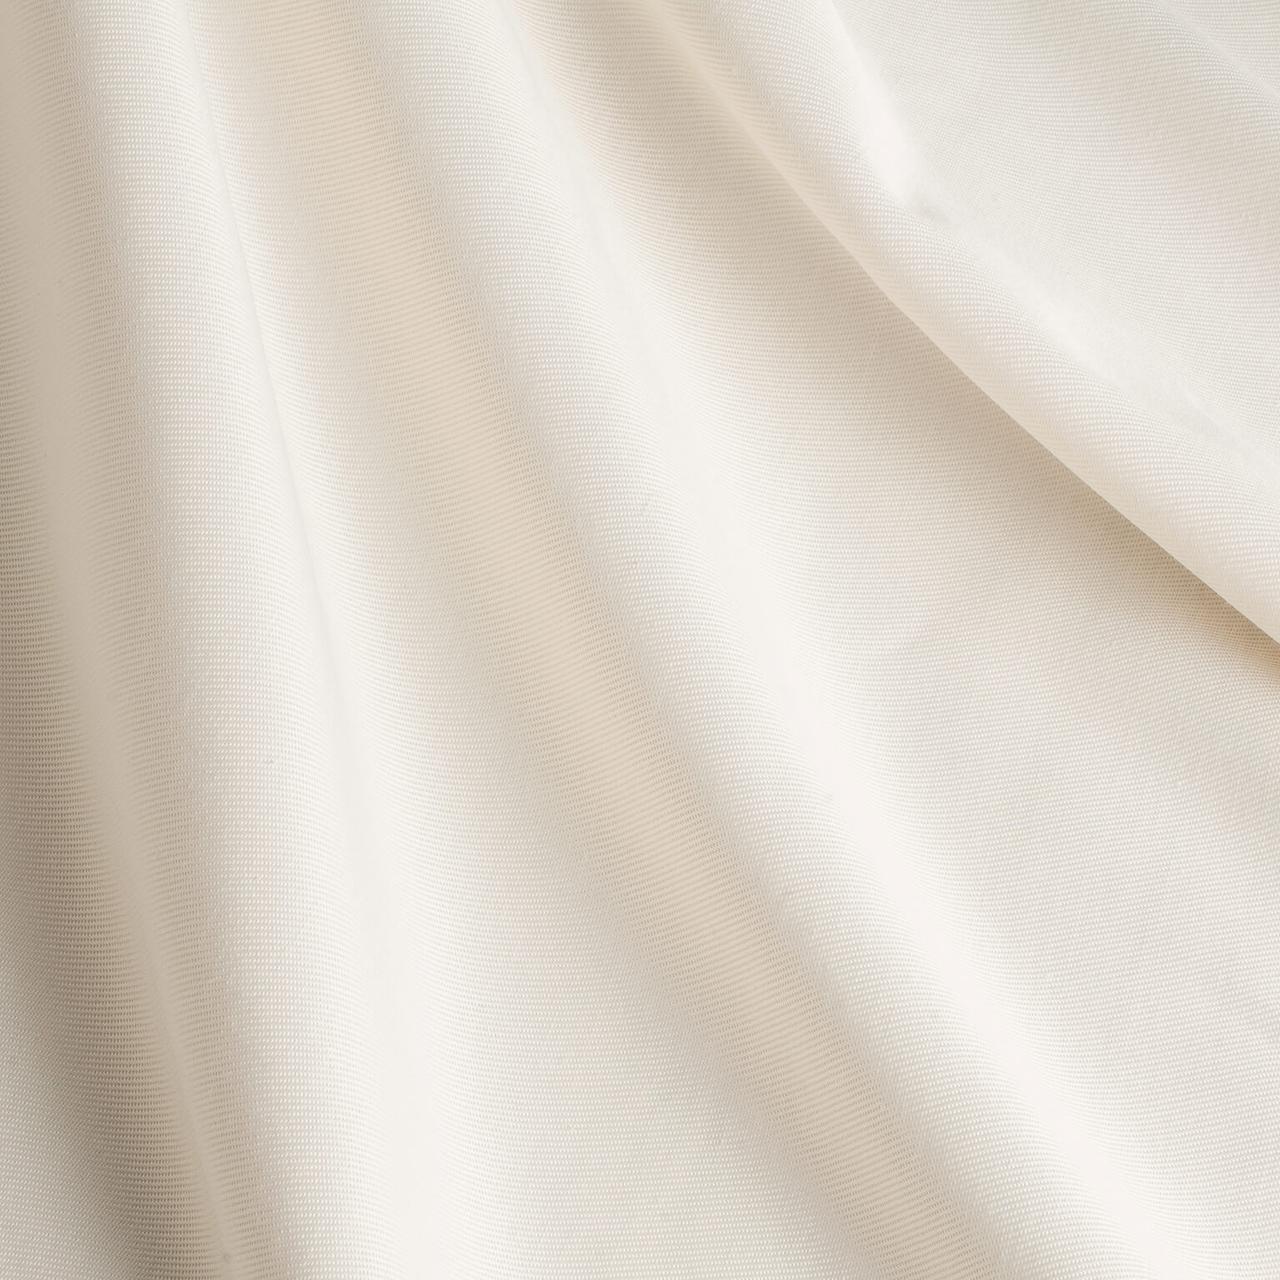 Ткань для скатертей и салфеток (ресторан) 81544v6